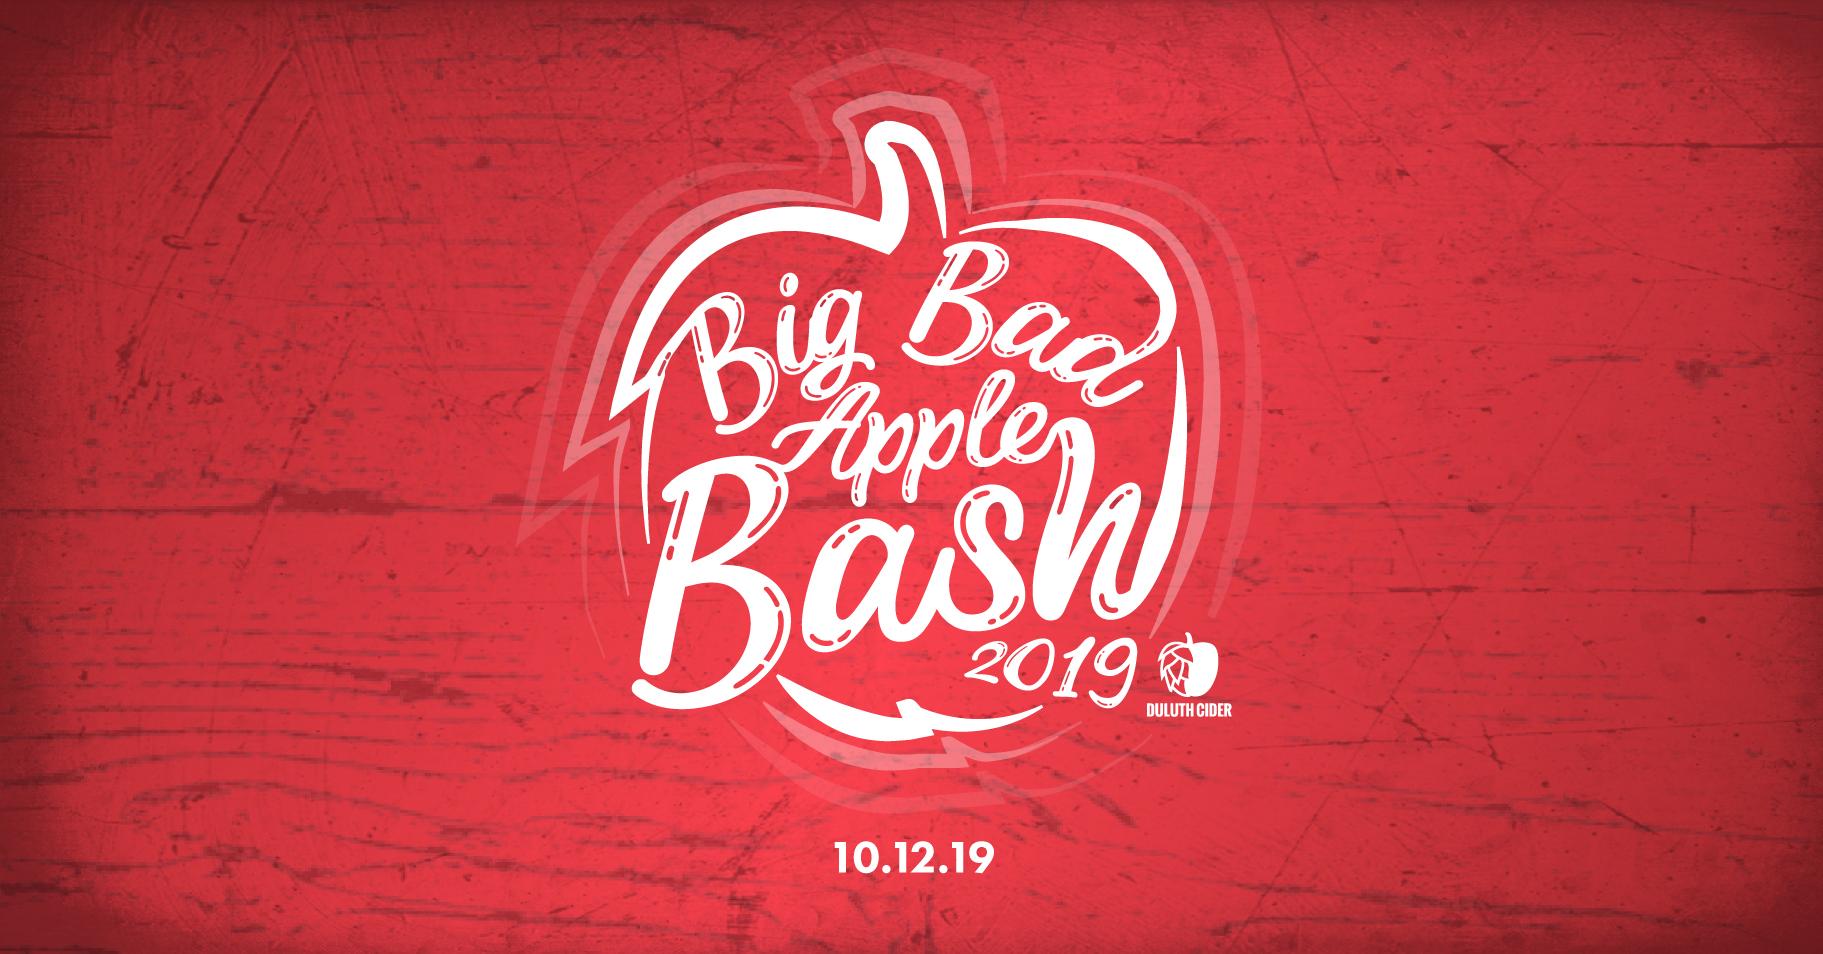 Big-Bad-Apple-Bash